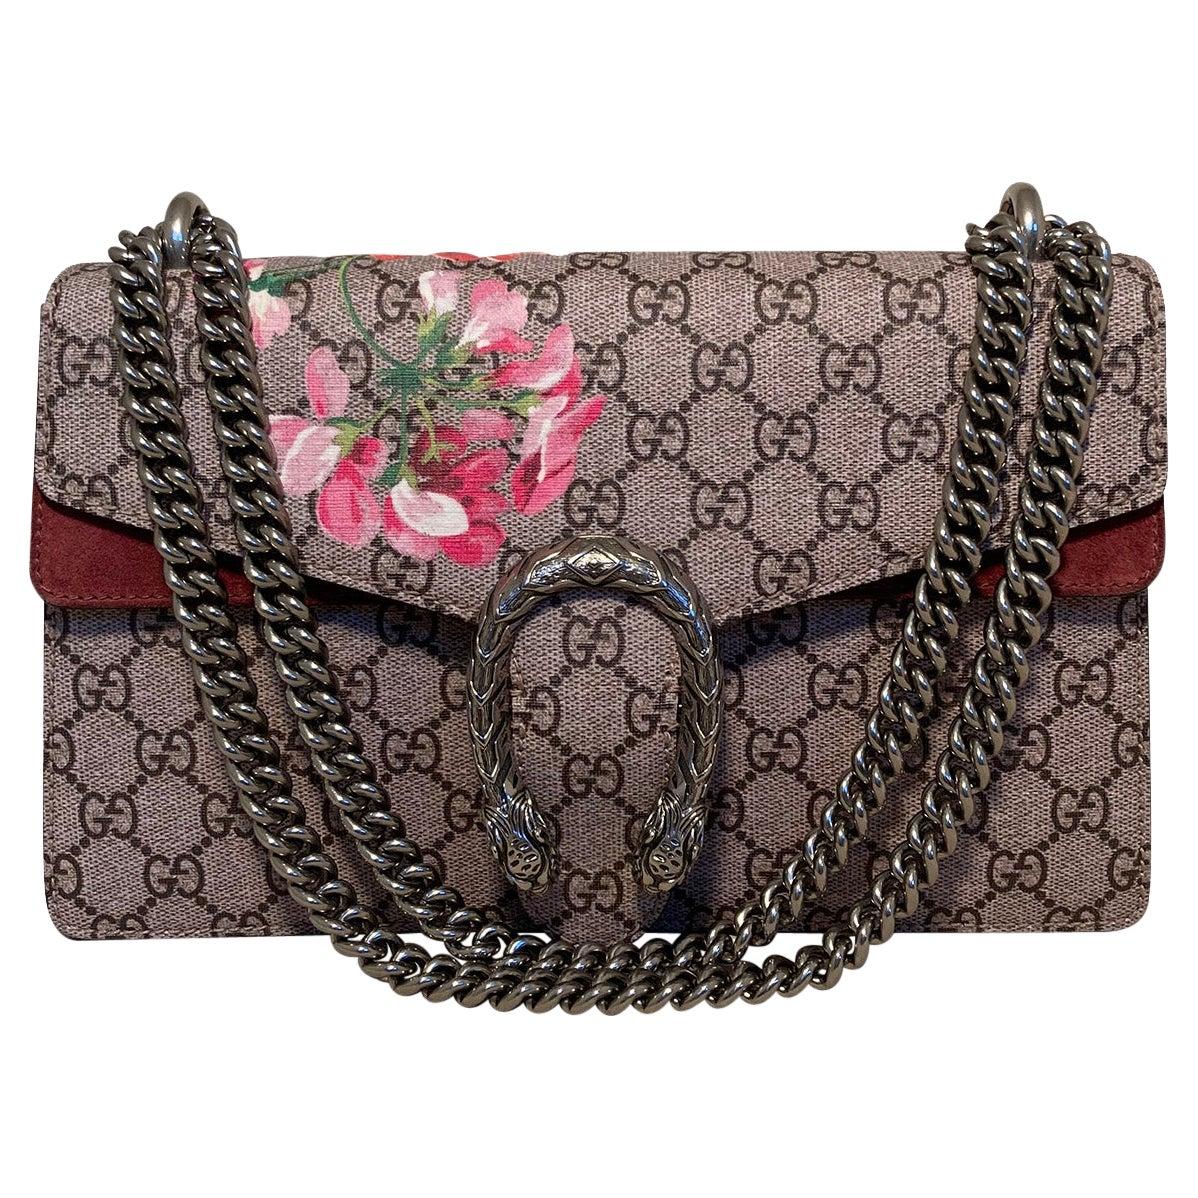 Gucci Dionysus small GG Blooms shoulder bag